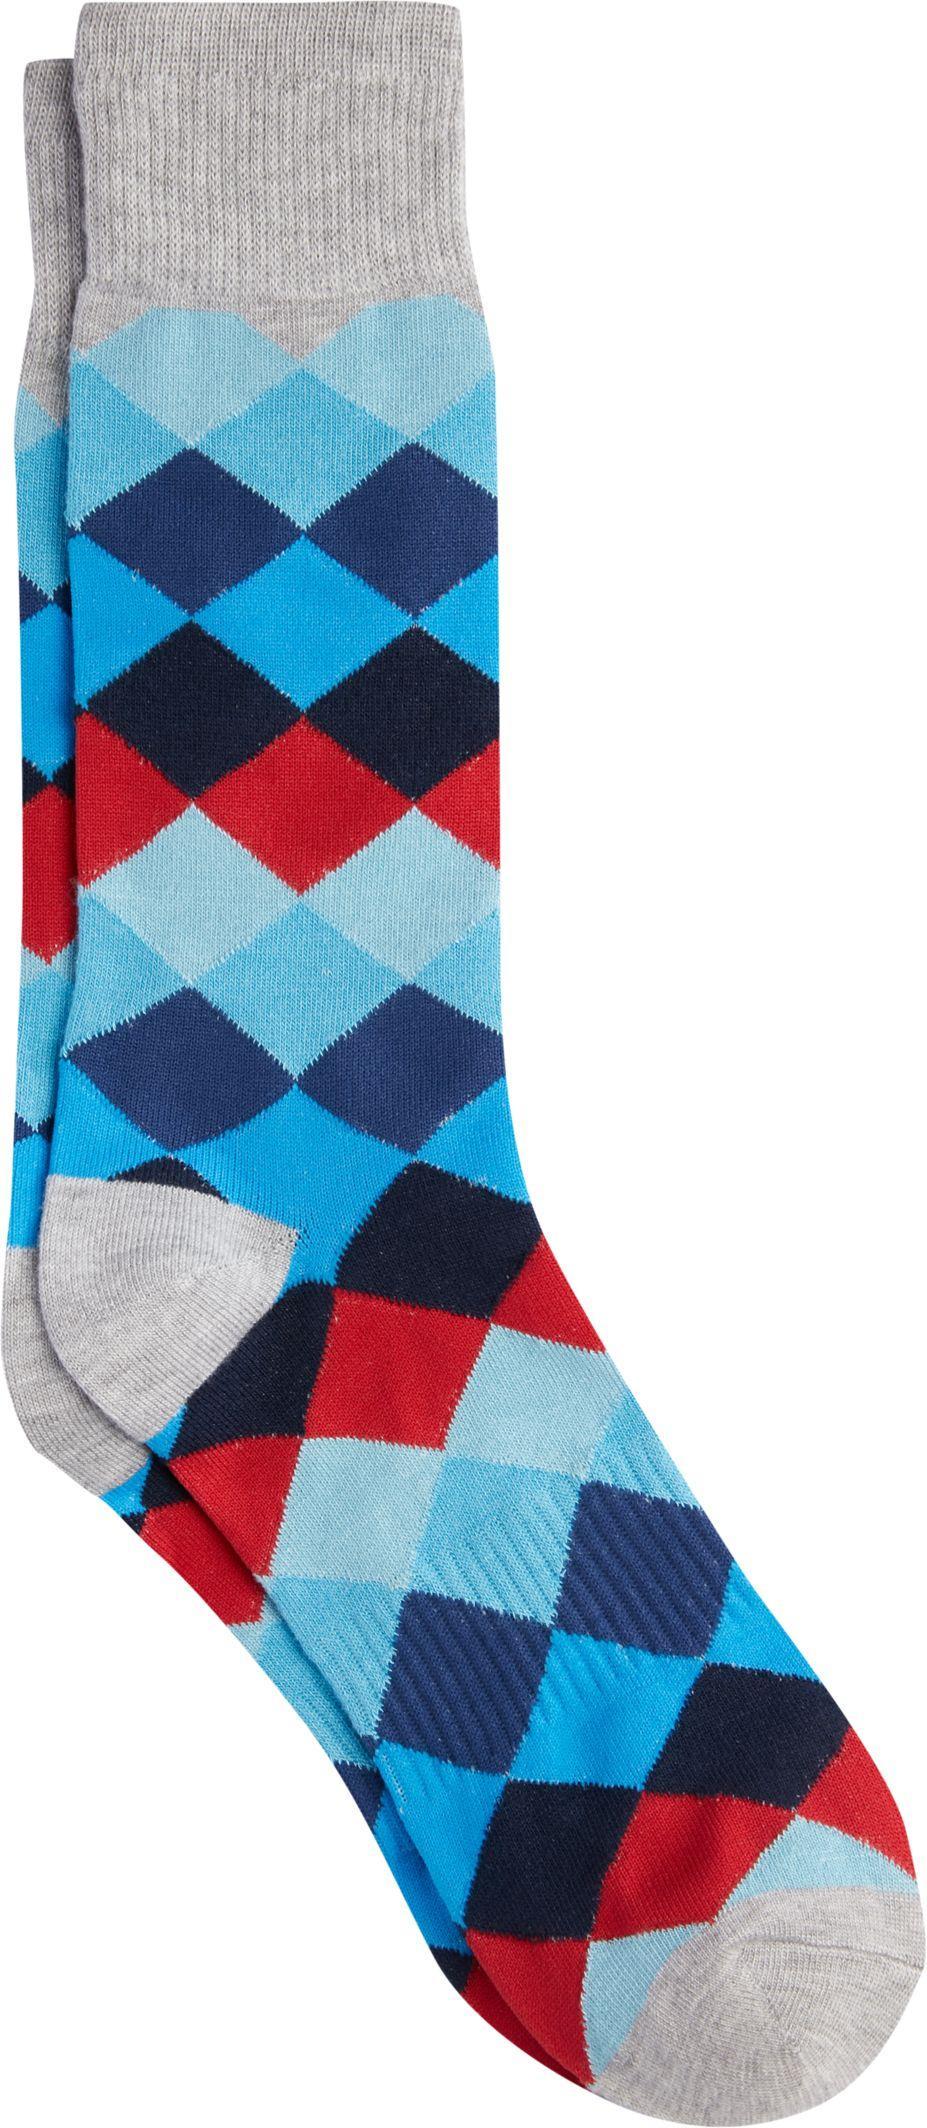 c0997dd3ceeb Lyst - Jos. A. Bank Diamond Dress Socks in Gray for Men